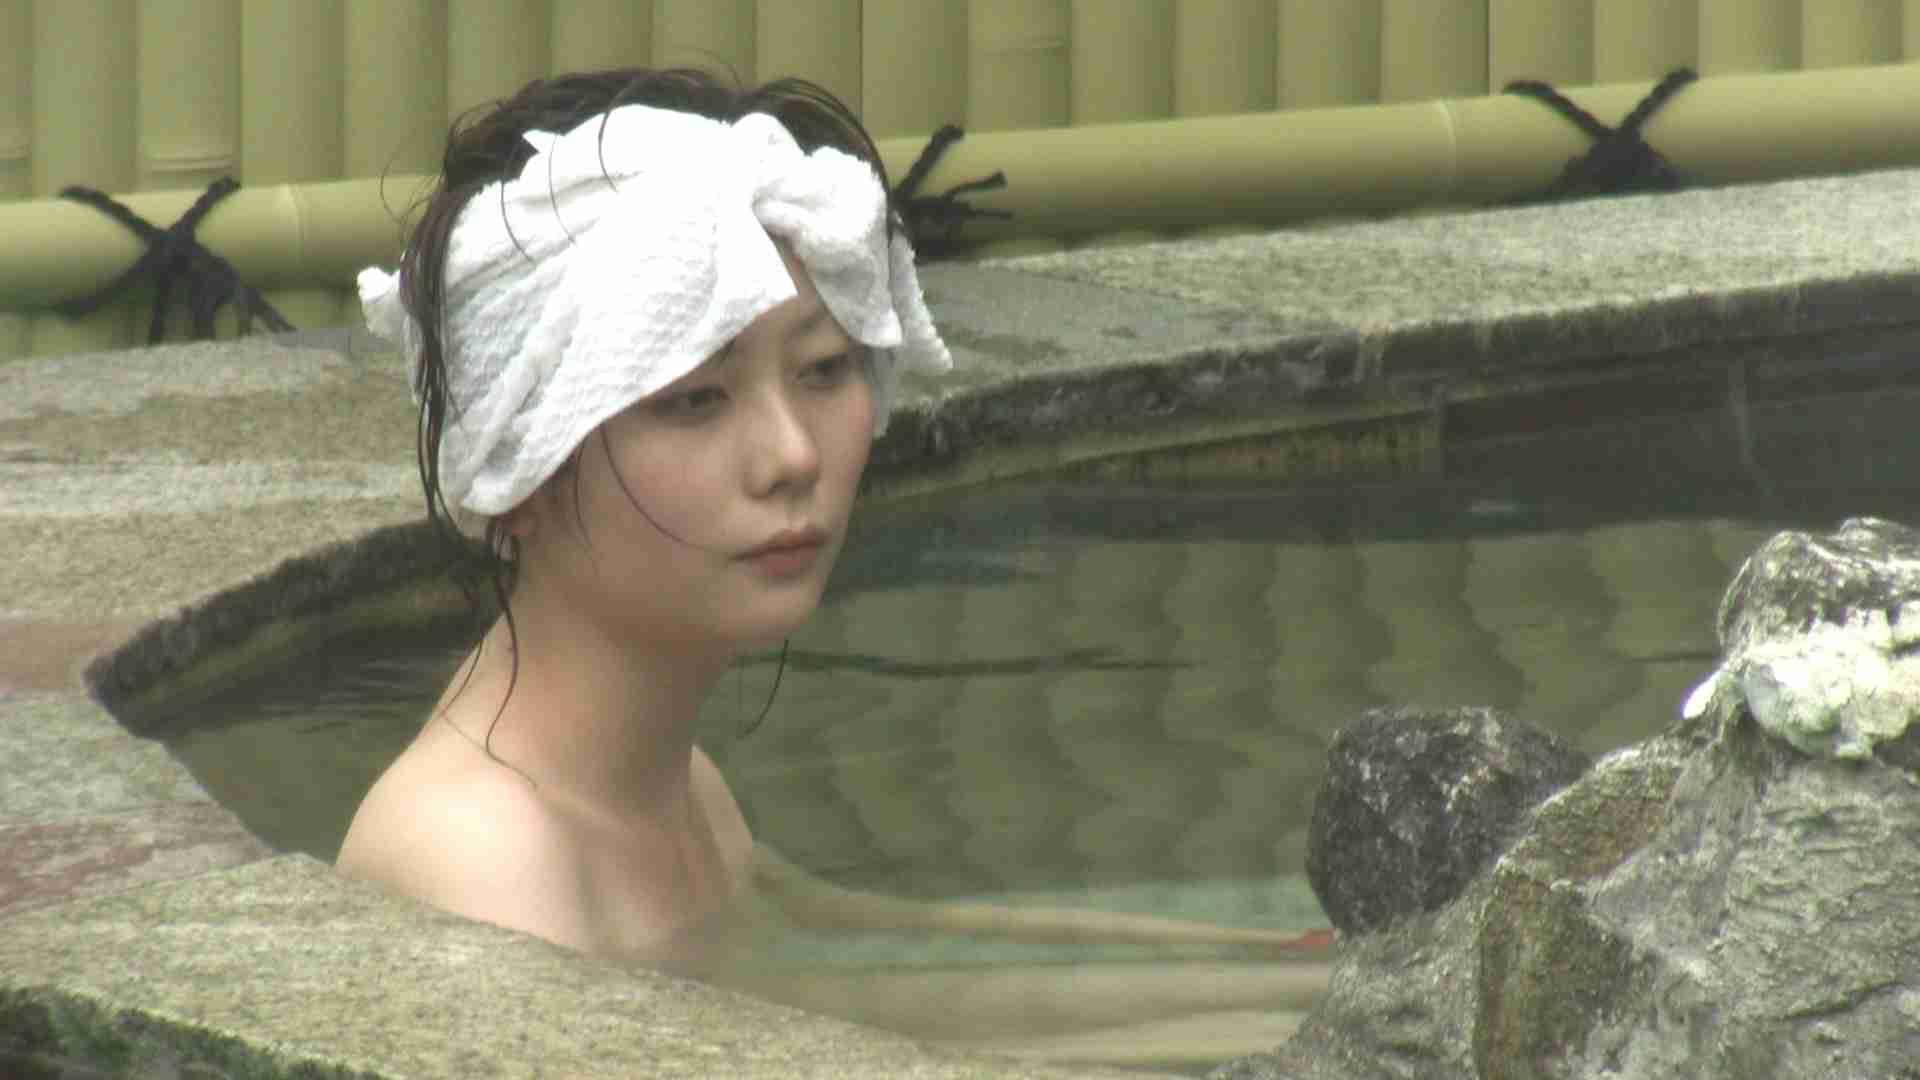 Aquaな露天風呂Vol.147 HなOL | 露天  103pic 60